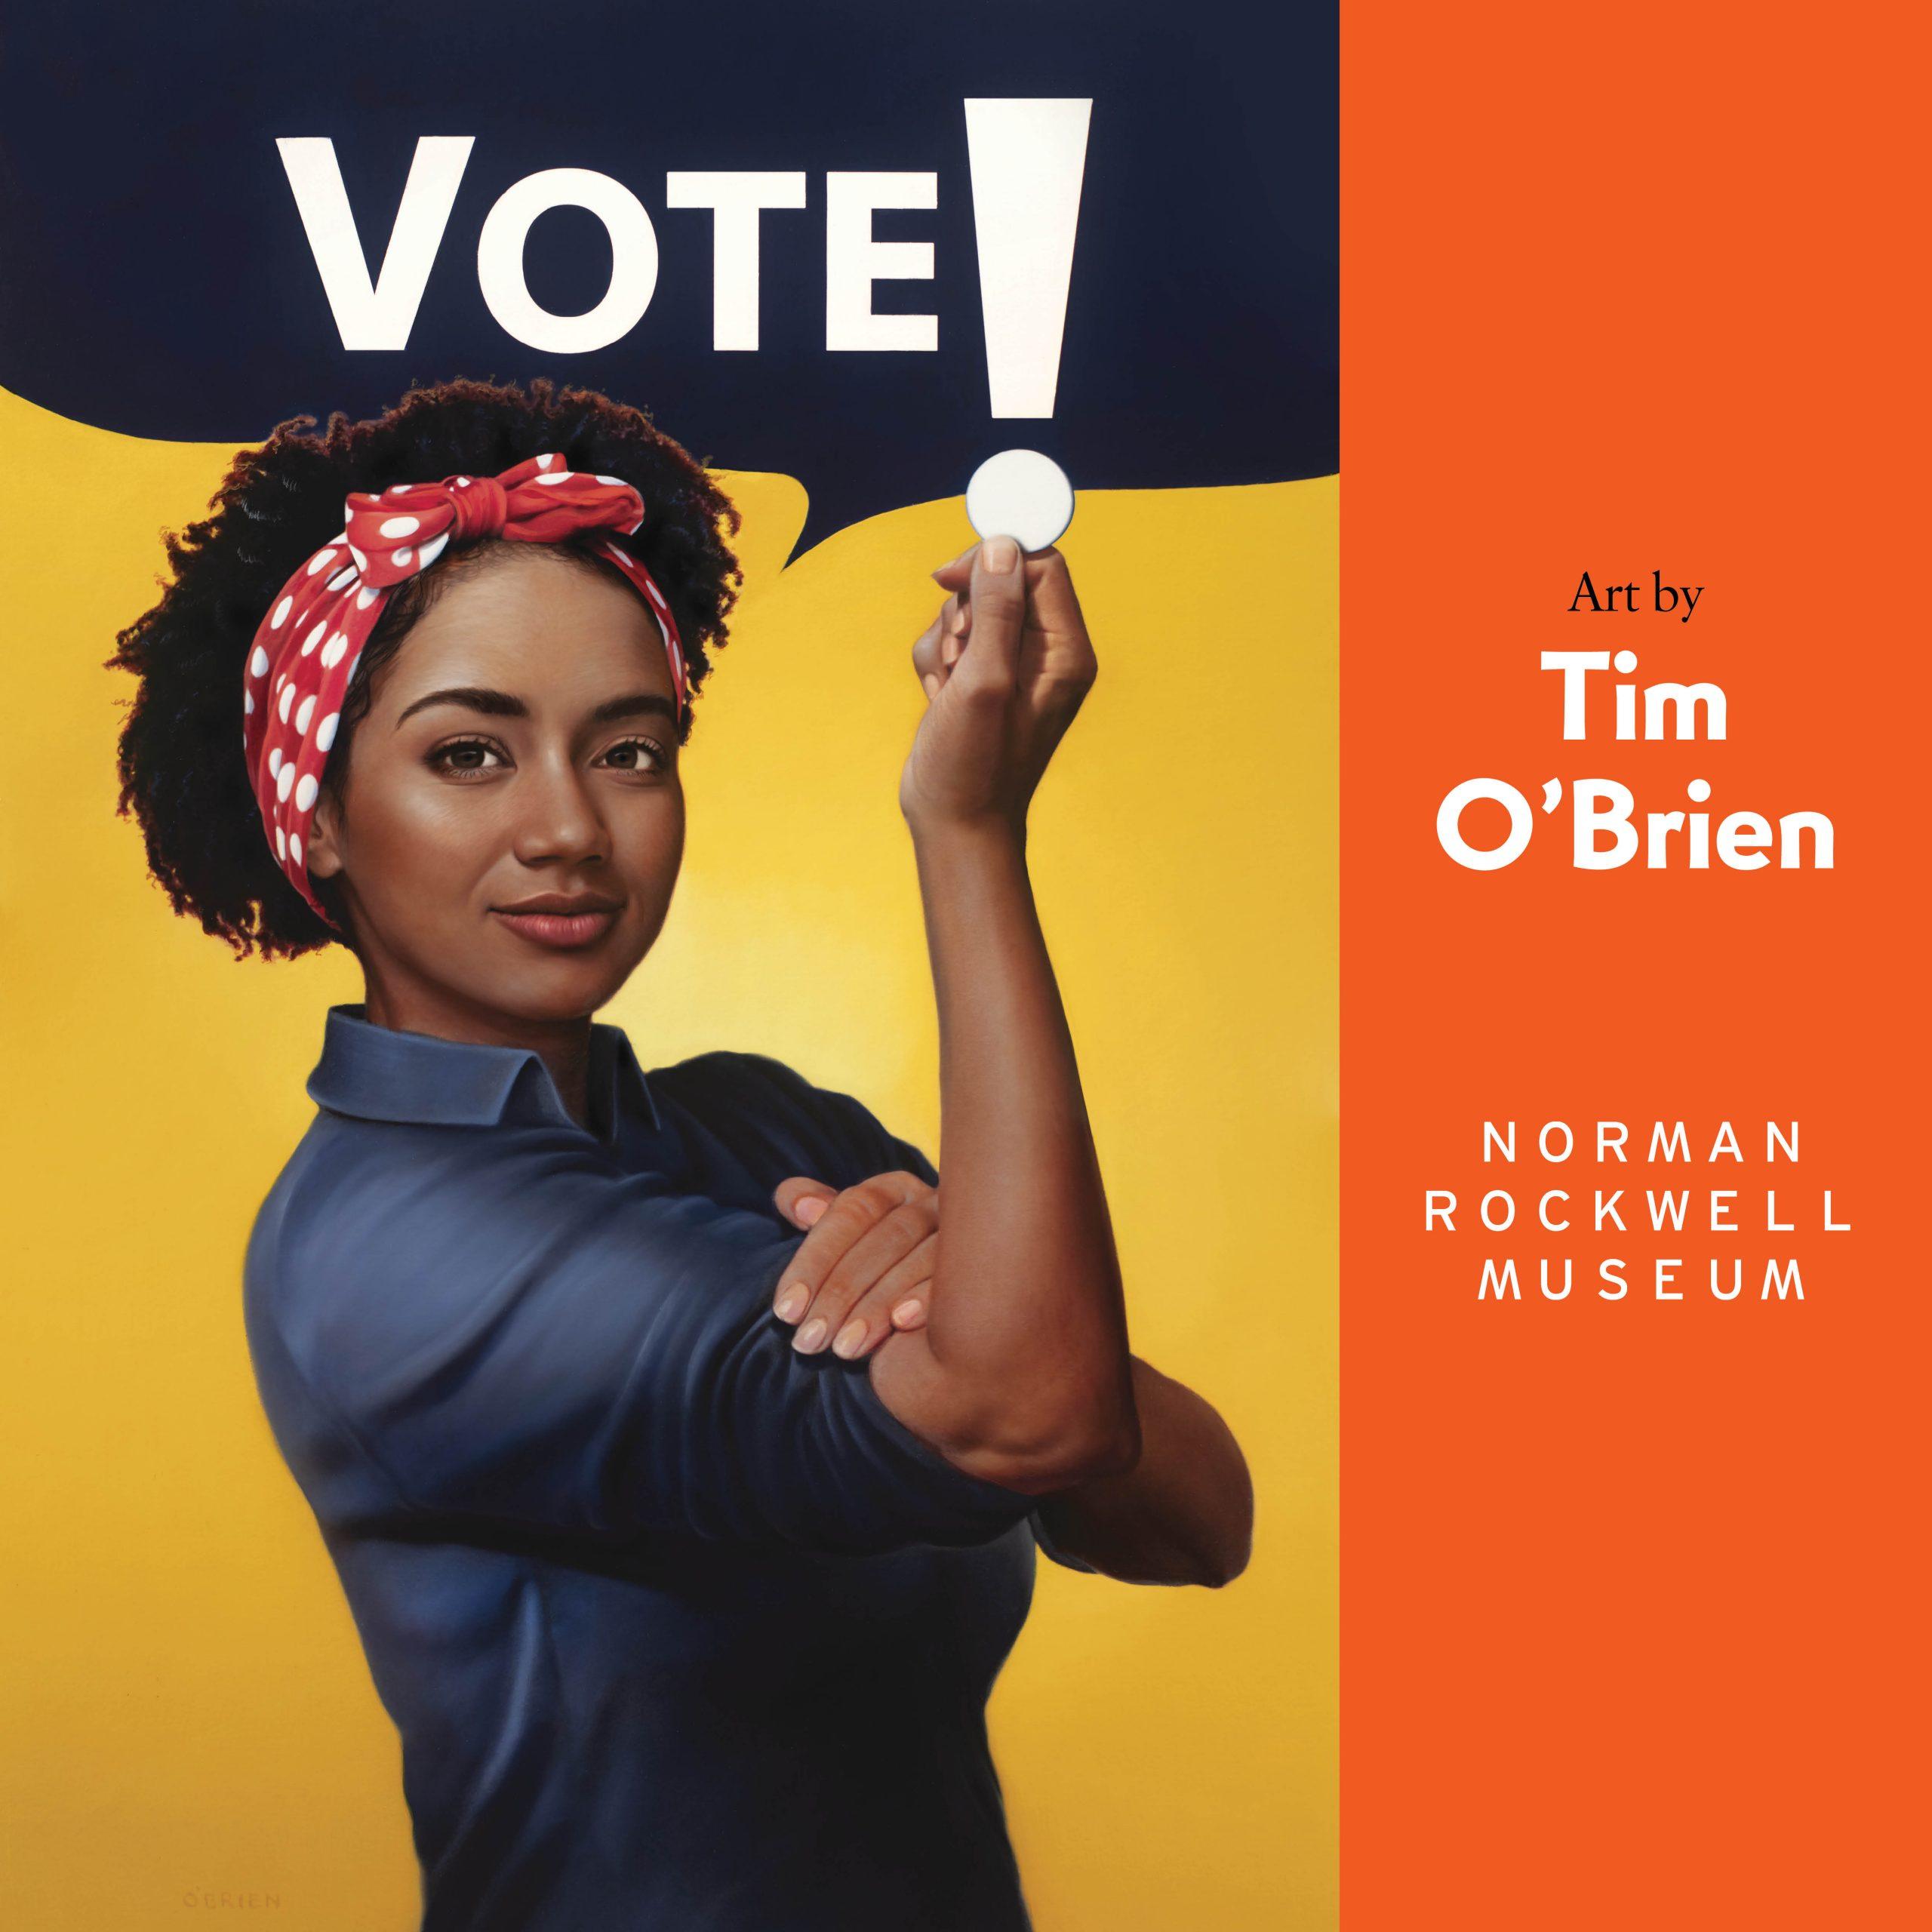 Tim O'Brien: Vote